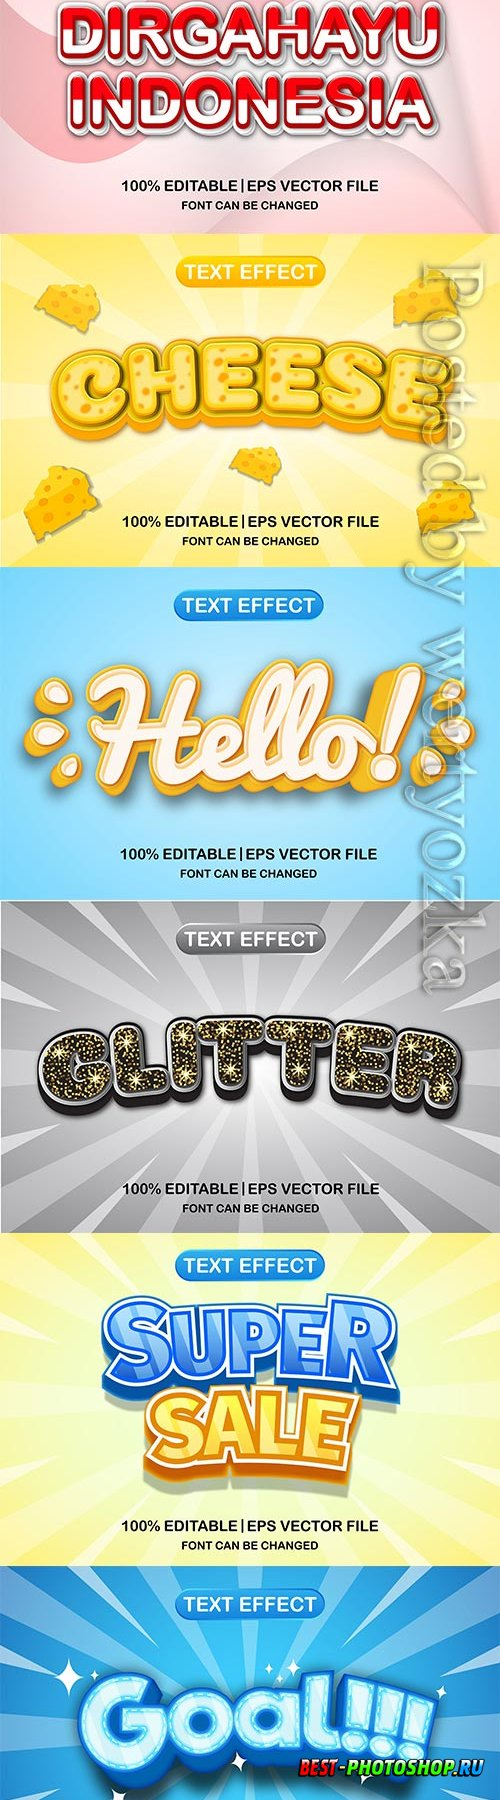 3d editable text style effect vector vol 638